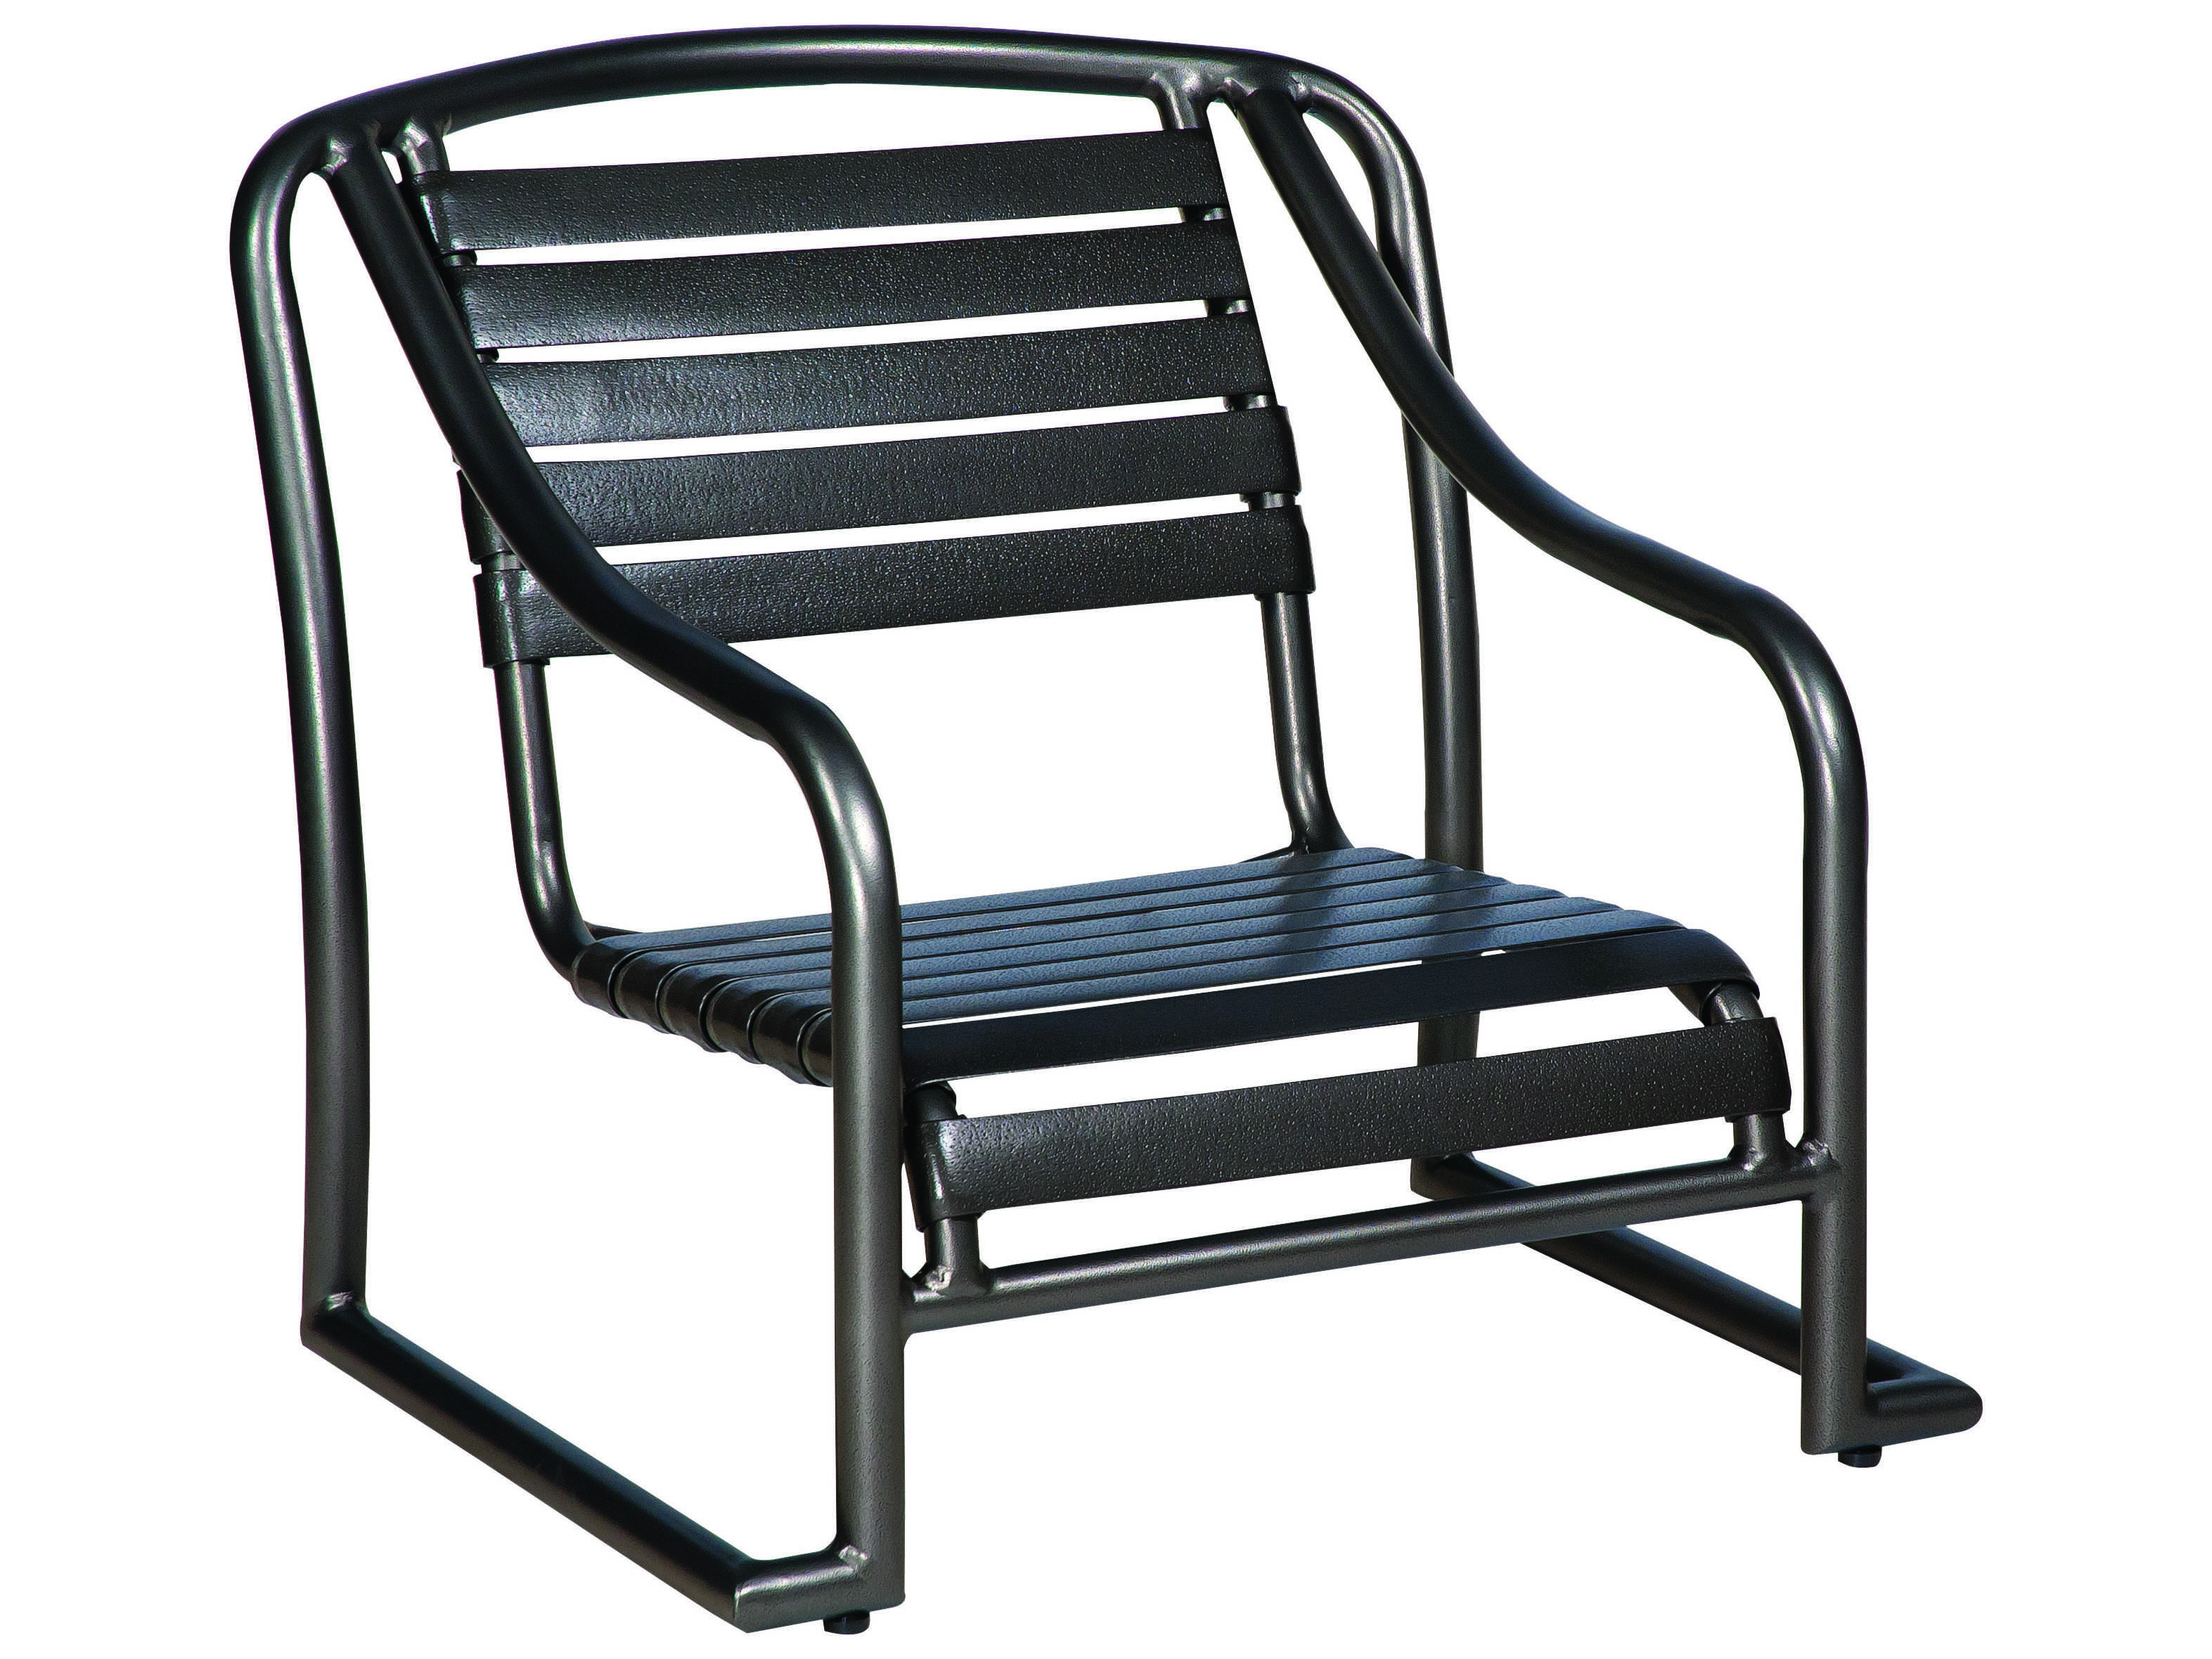 Woodard Baja Strap Aluminum Stackable Sand Chair 230450